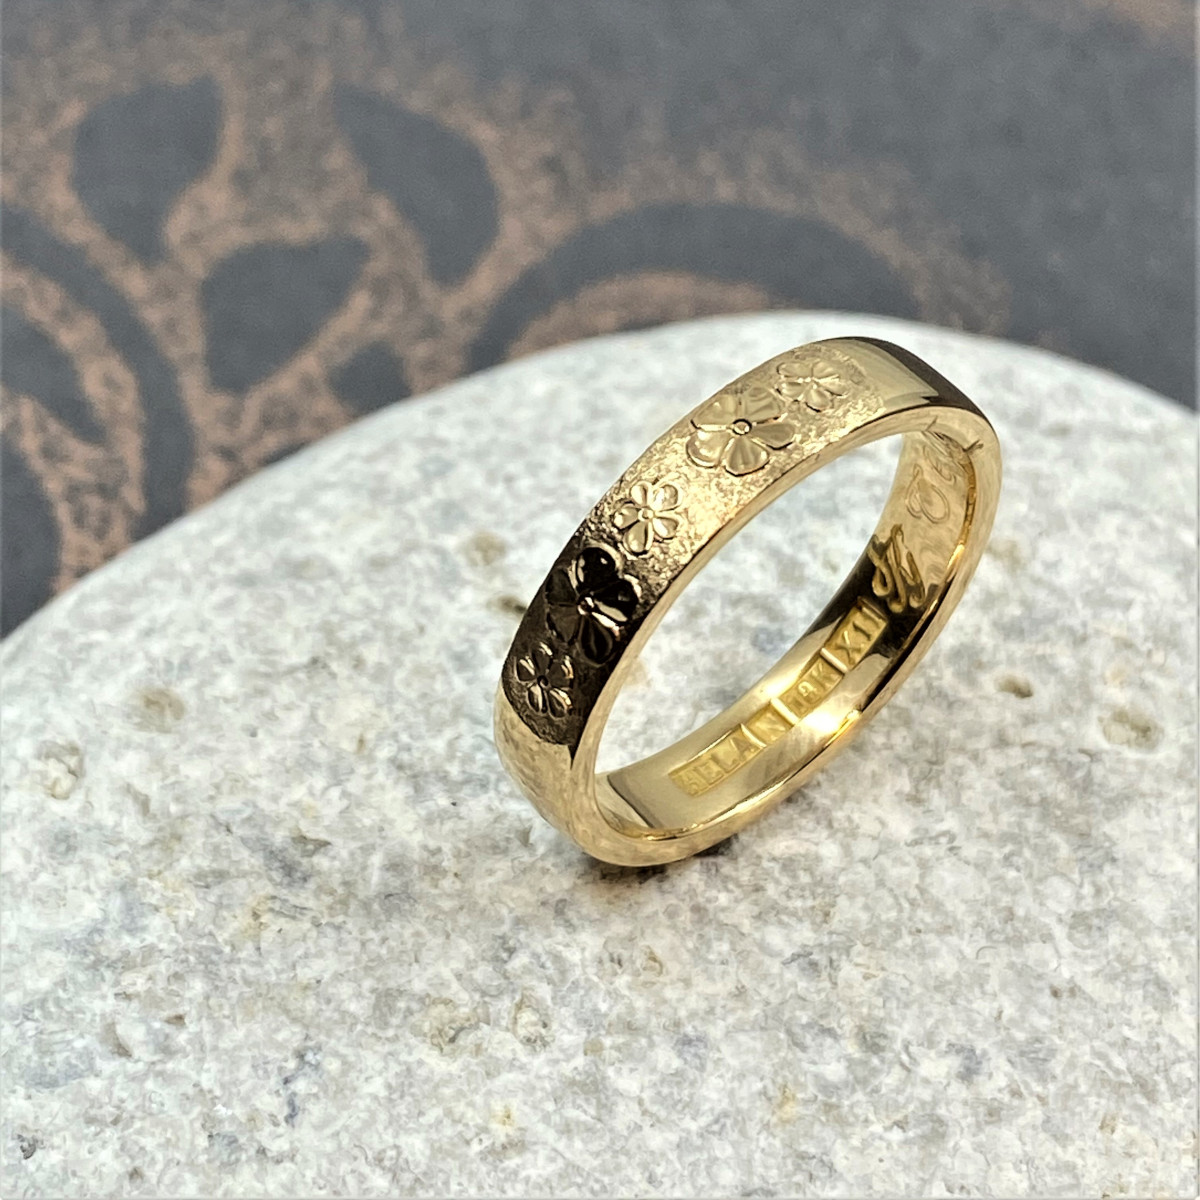 Handgraverad ring, blomring, ring med blommor